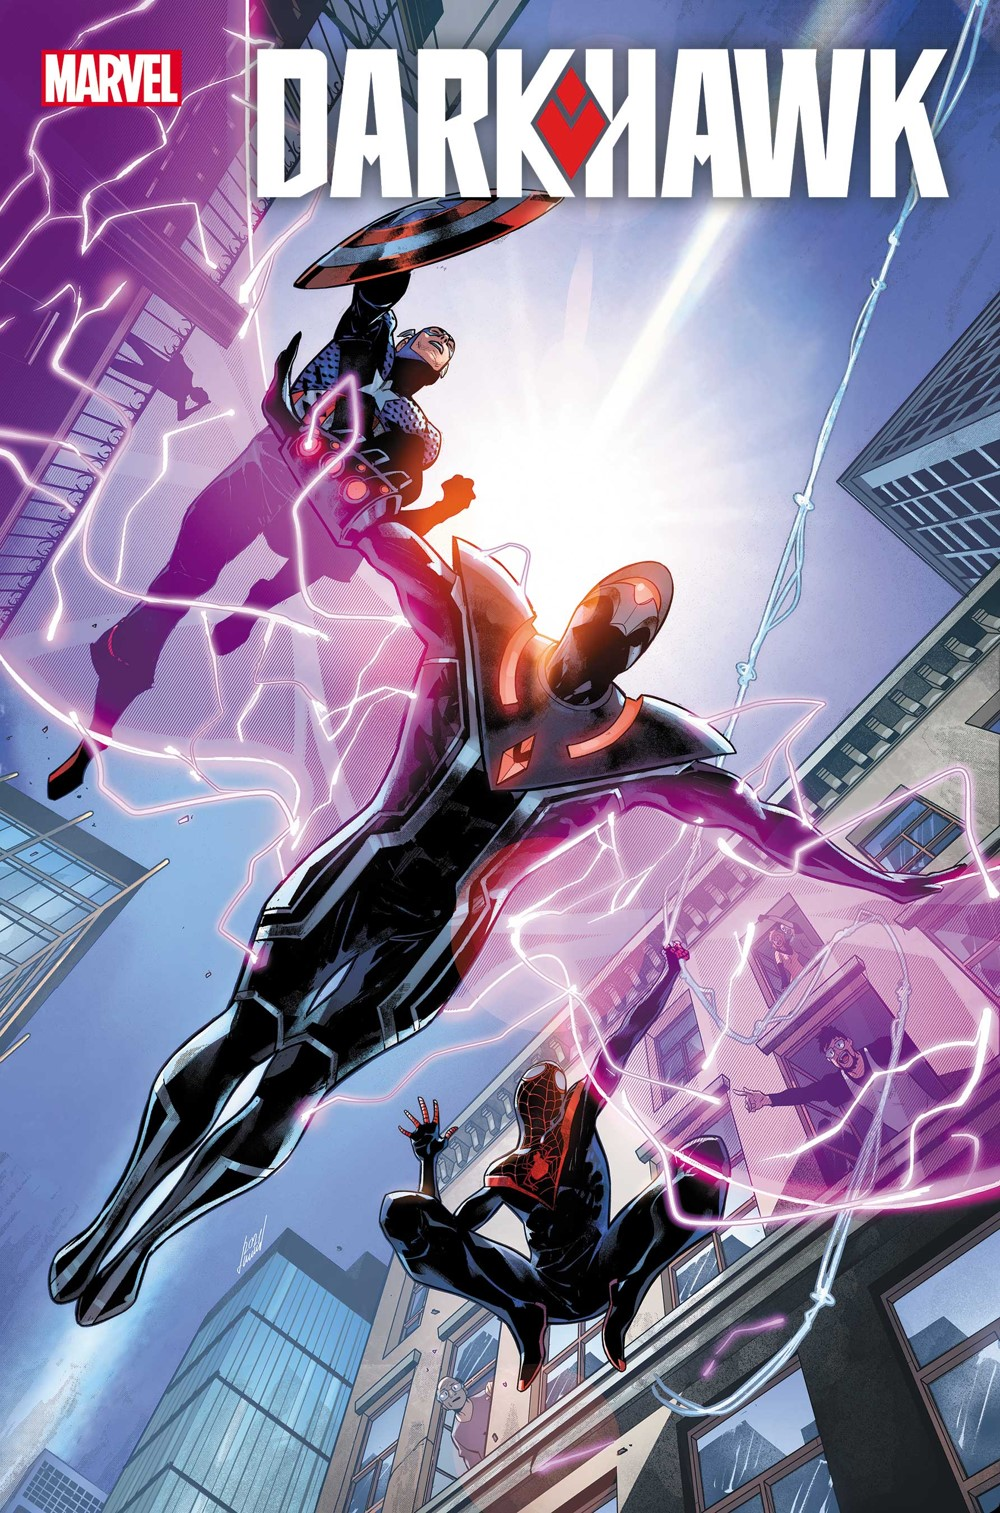 DRKHWK2021004_cov Marvel Comics November 2021 Solicitations